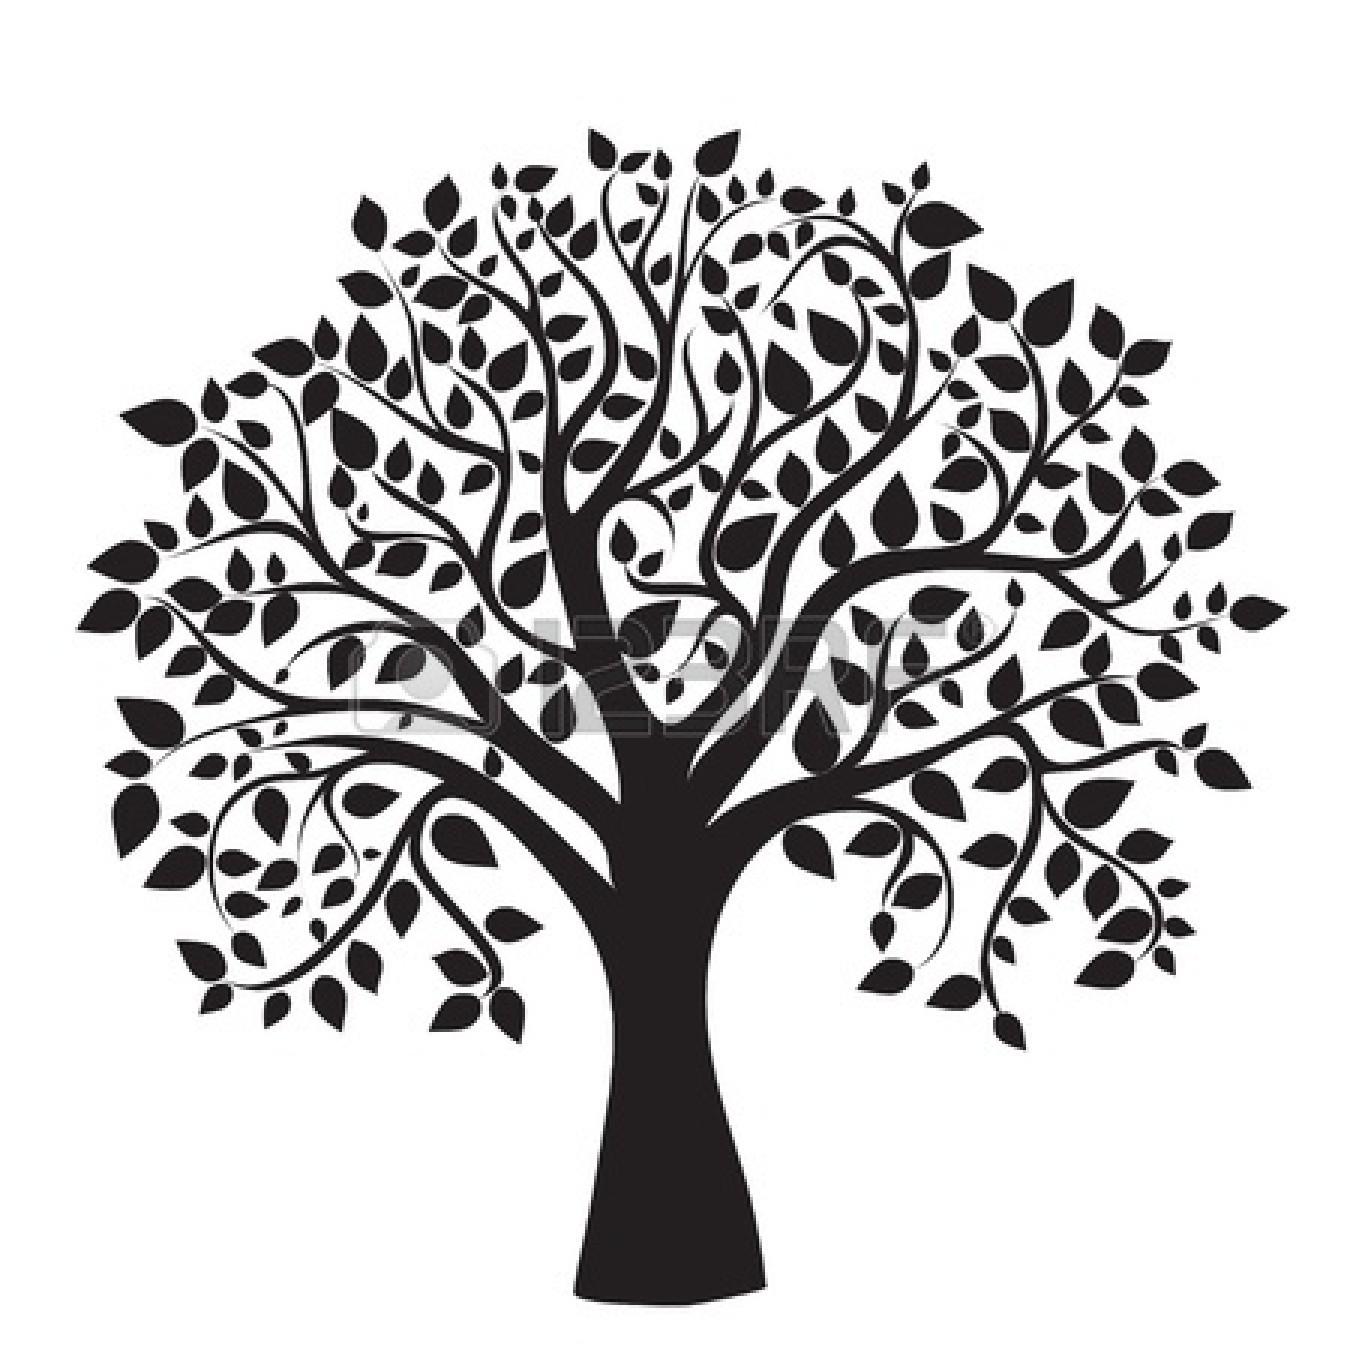 Tree Of Life Clipart-tree of life clipart-16